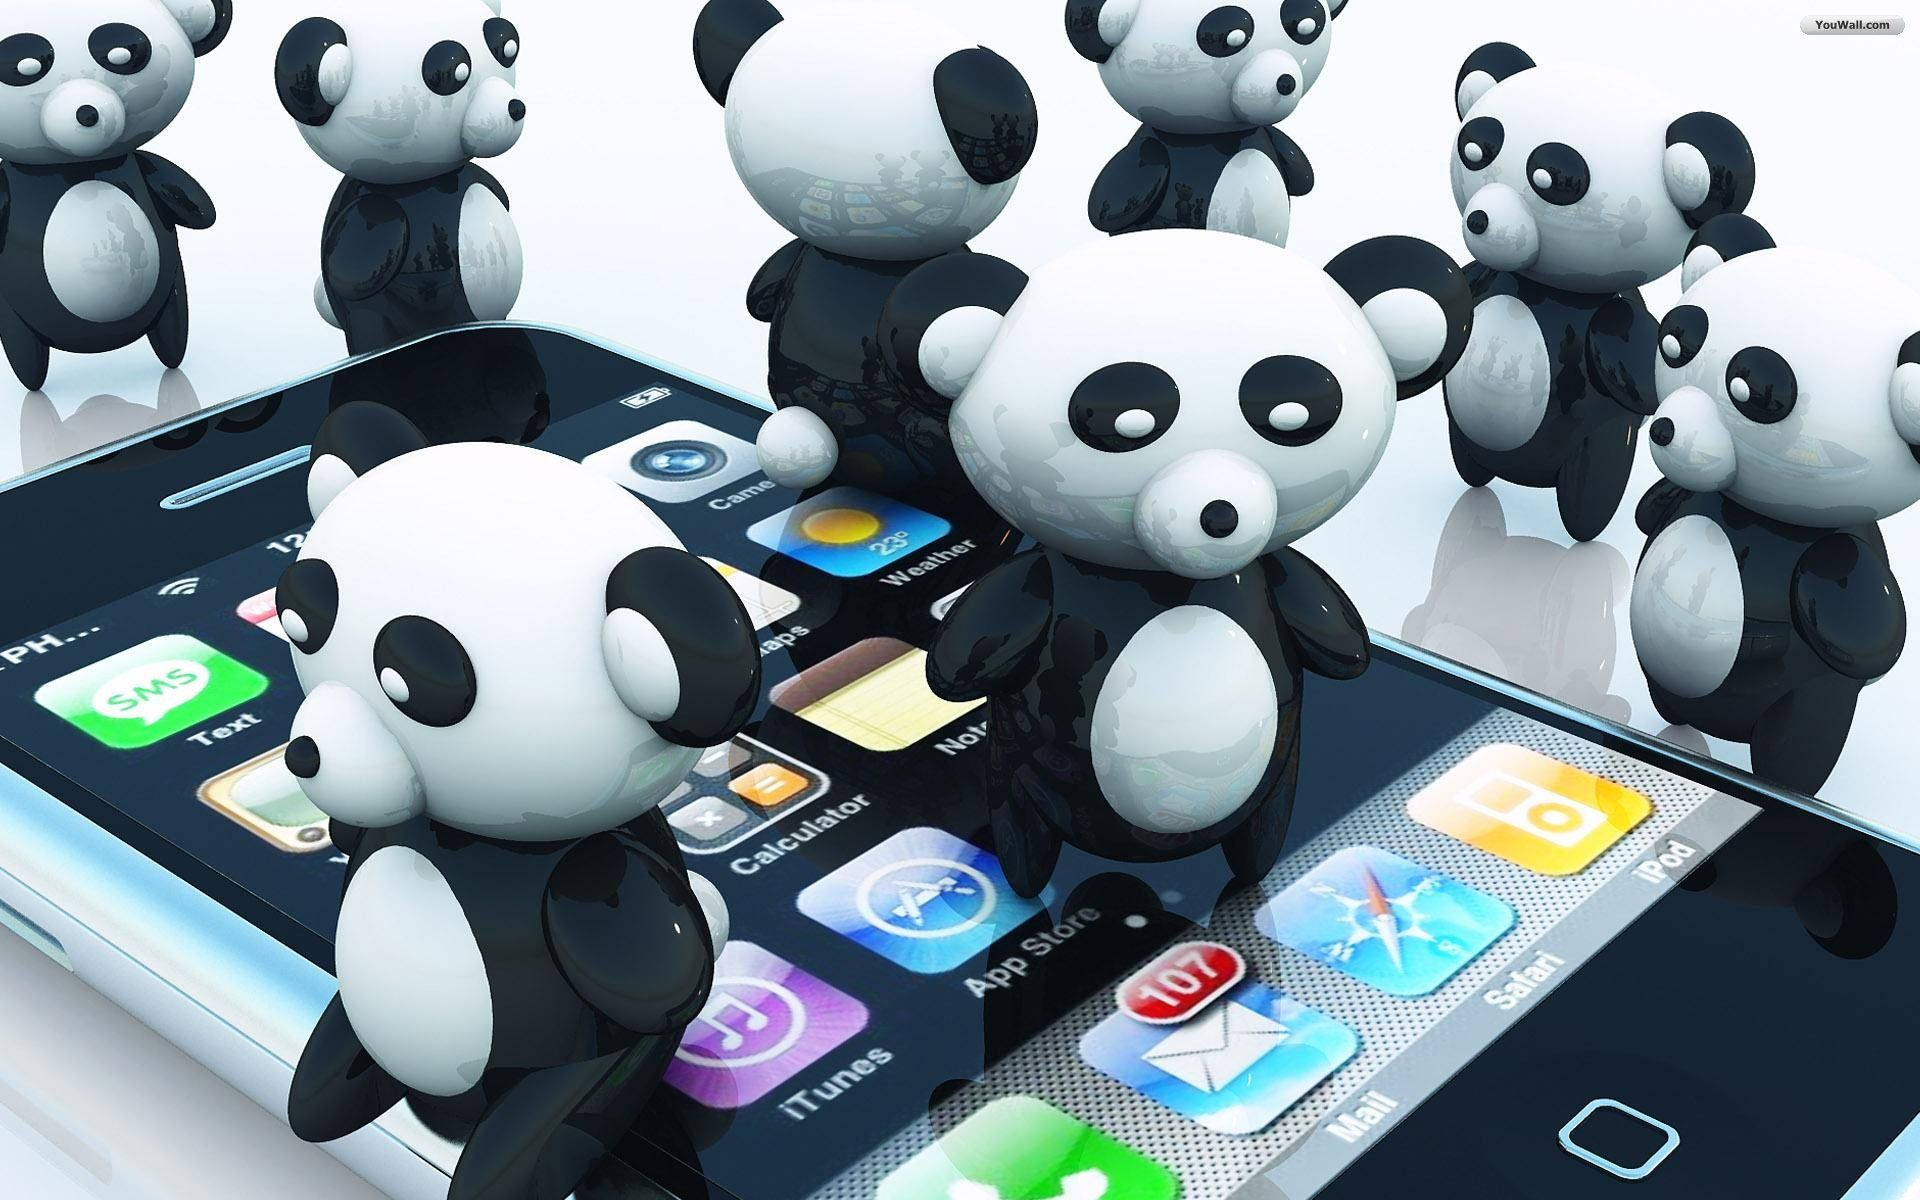 iPhone Panda's | Iphone wallpaper, Iphone, Panda